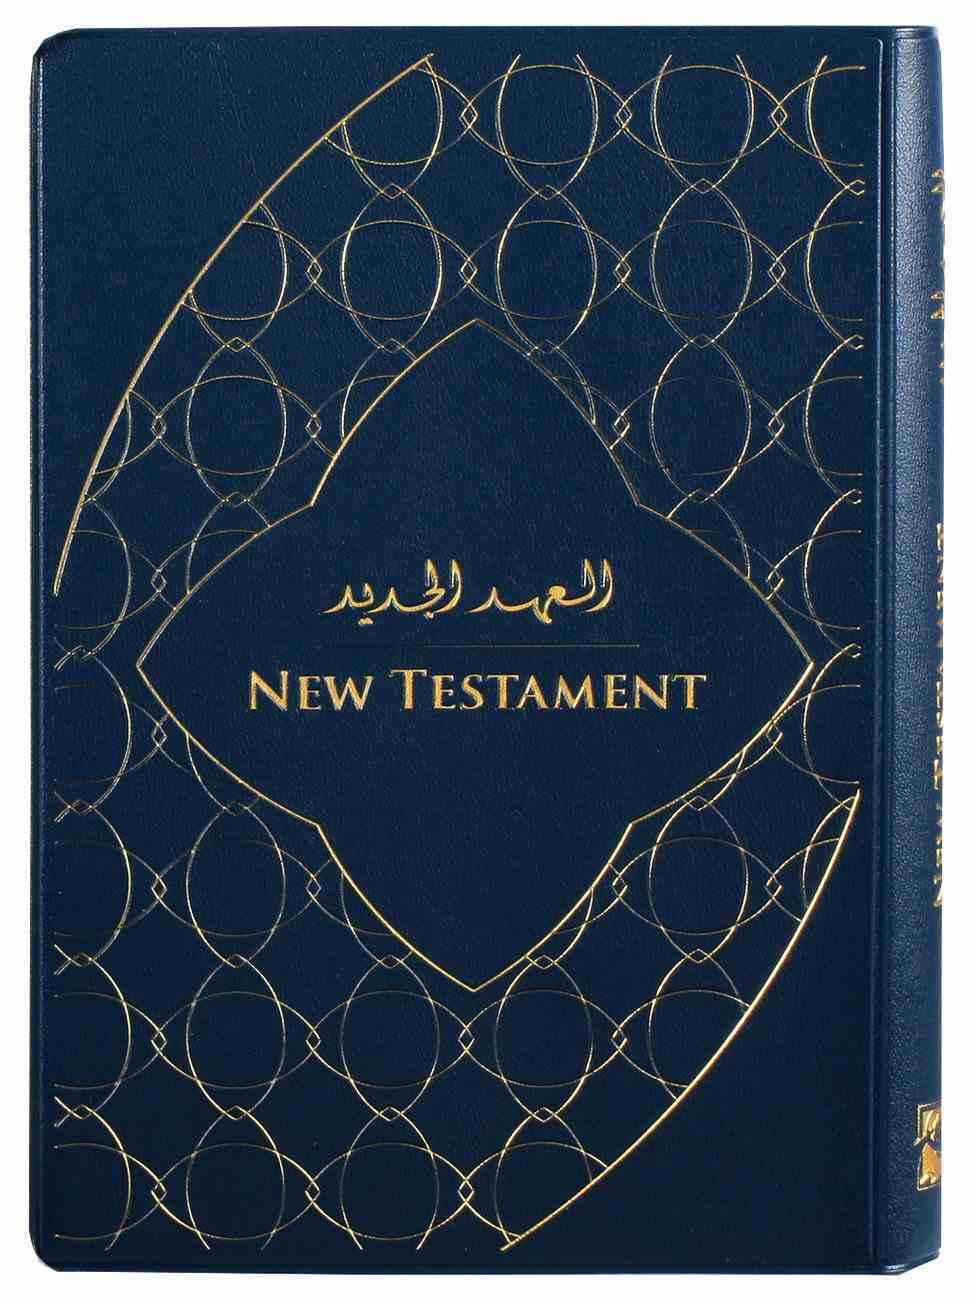 Gnt Alinjiil Arabic/English New Testament (The Gospel) Imitation Leather